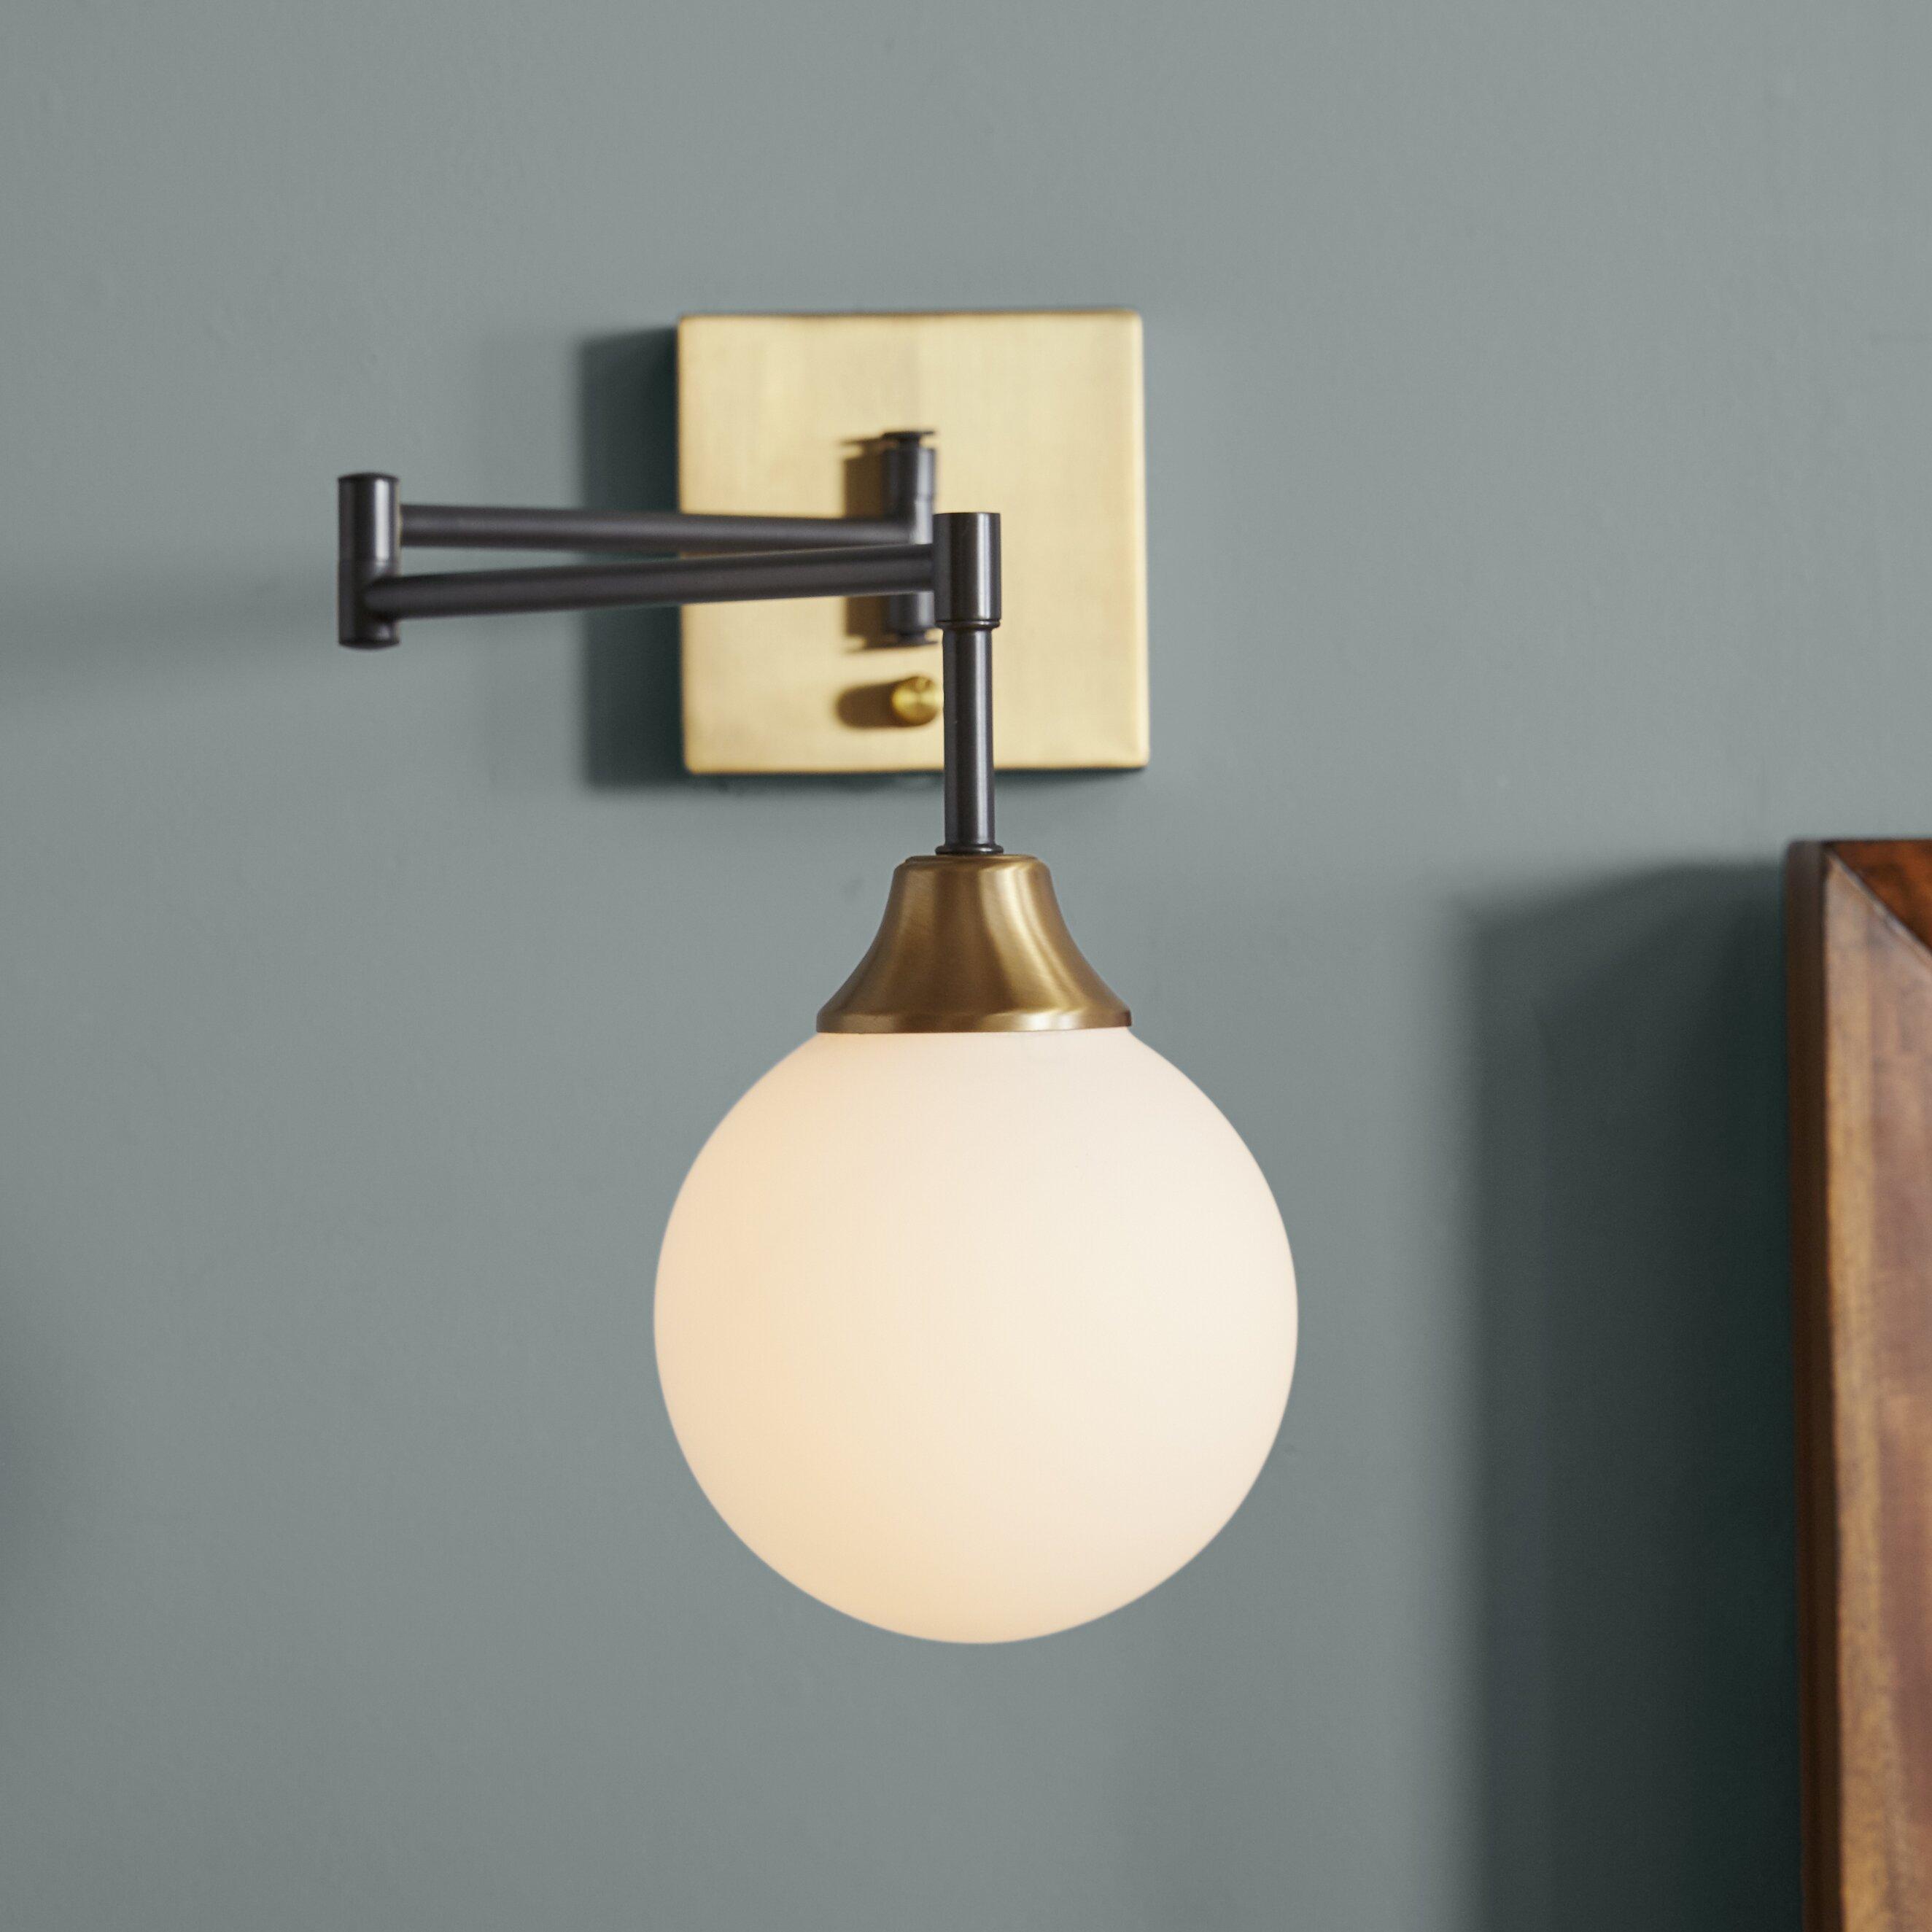 bedroom wall lamps design luxury wall lamps set vintage decor reading bedroom swing arm adjustable lighting